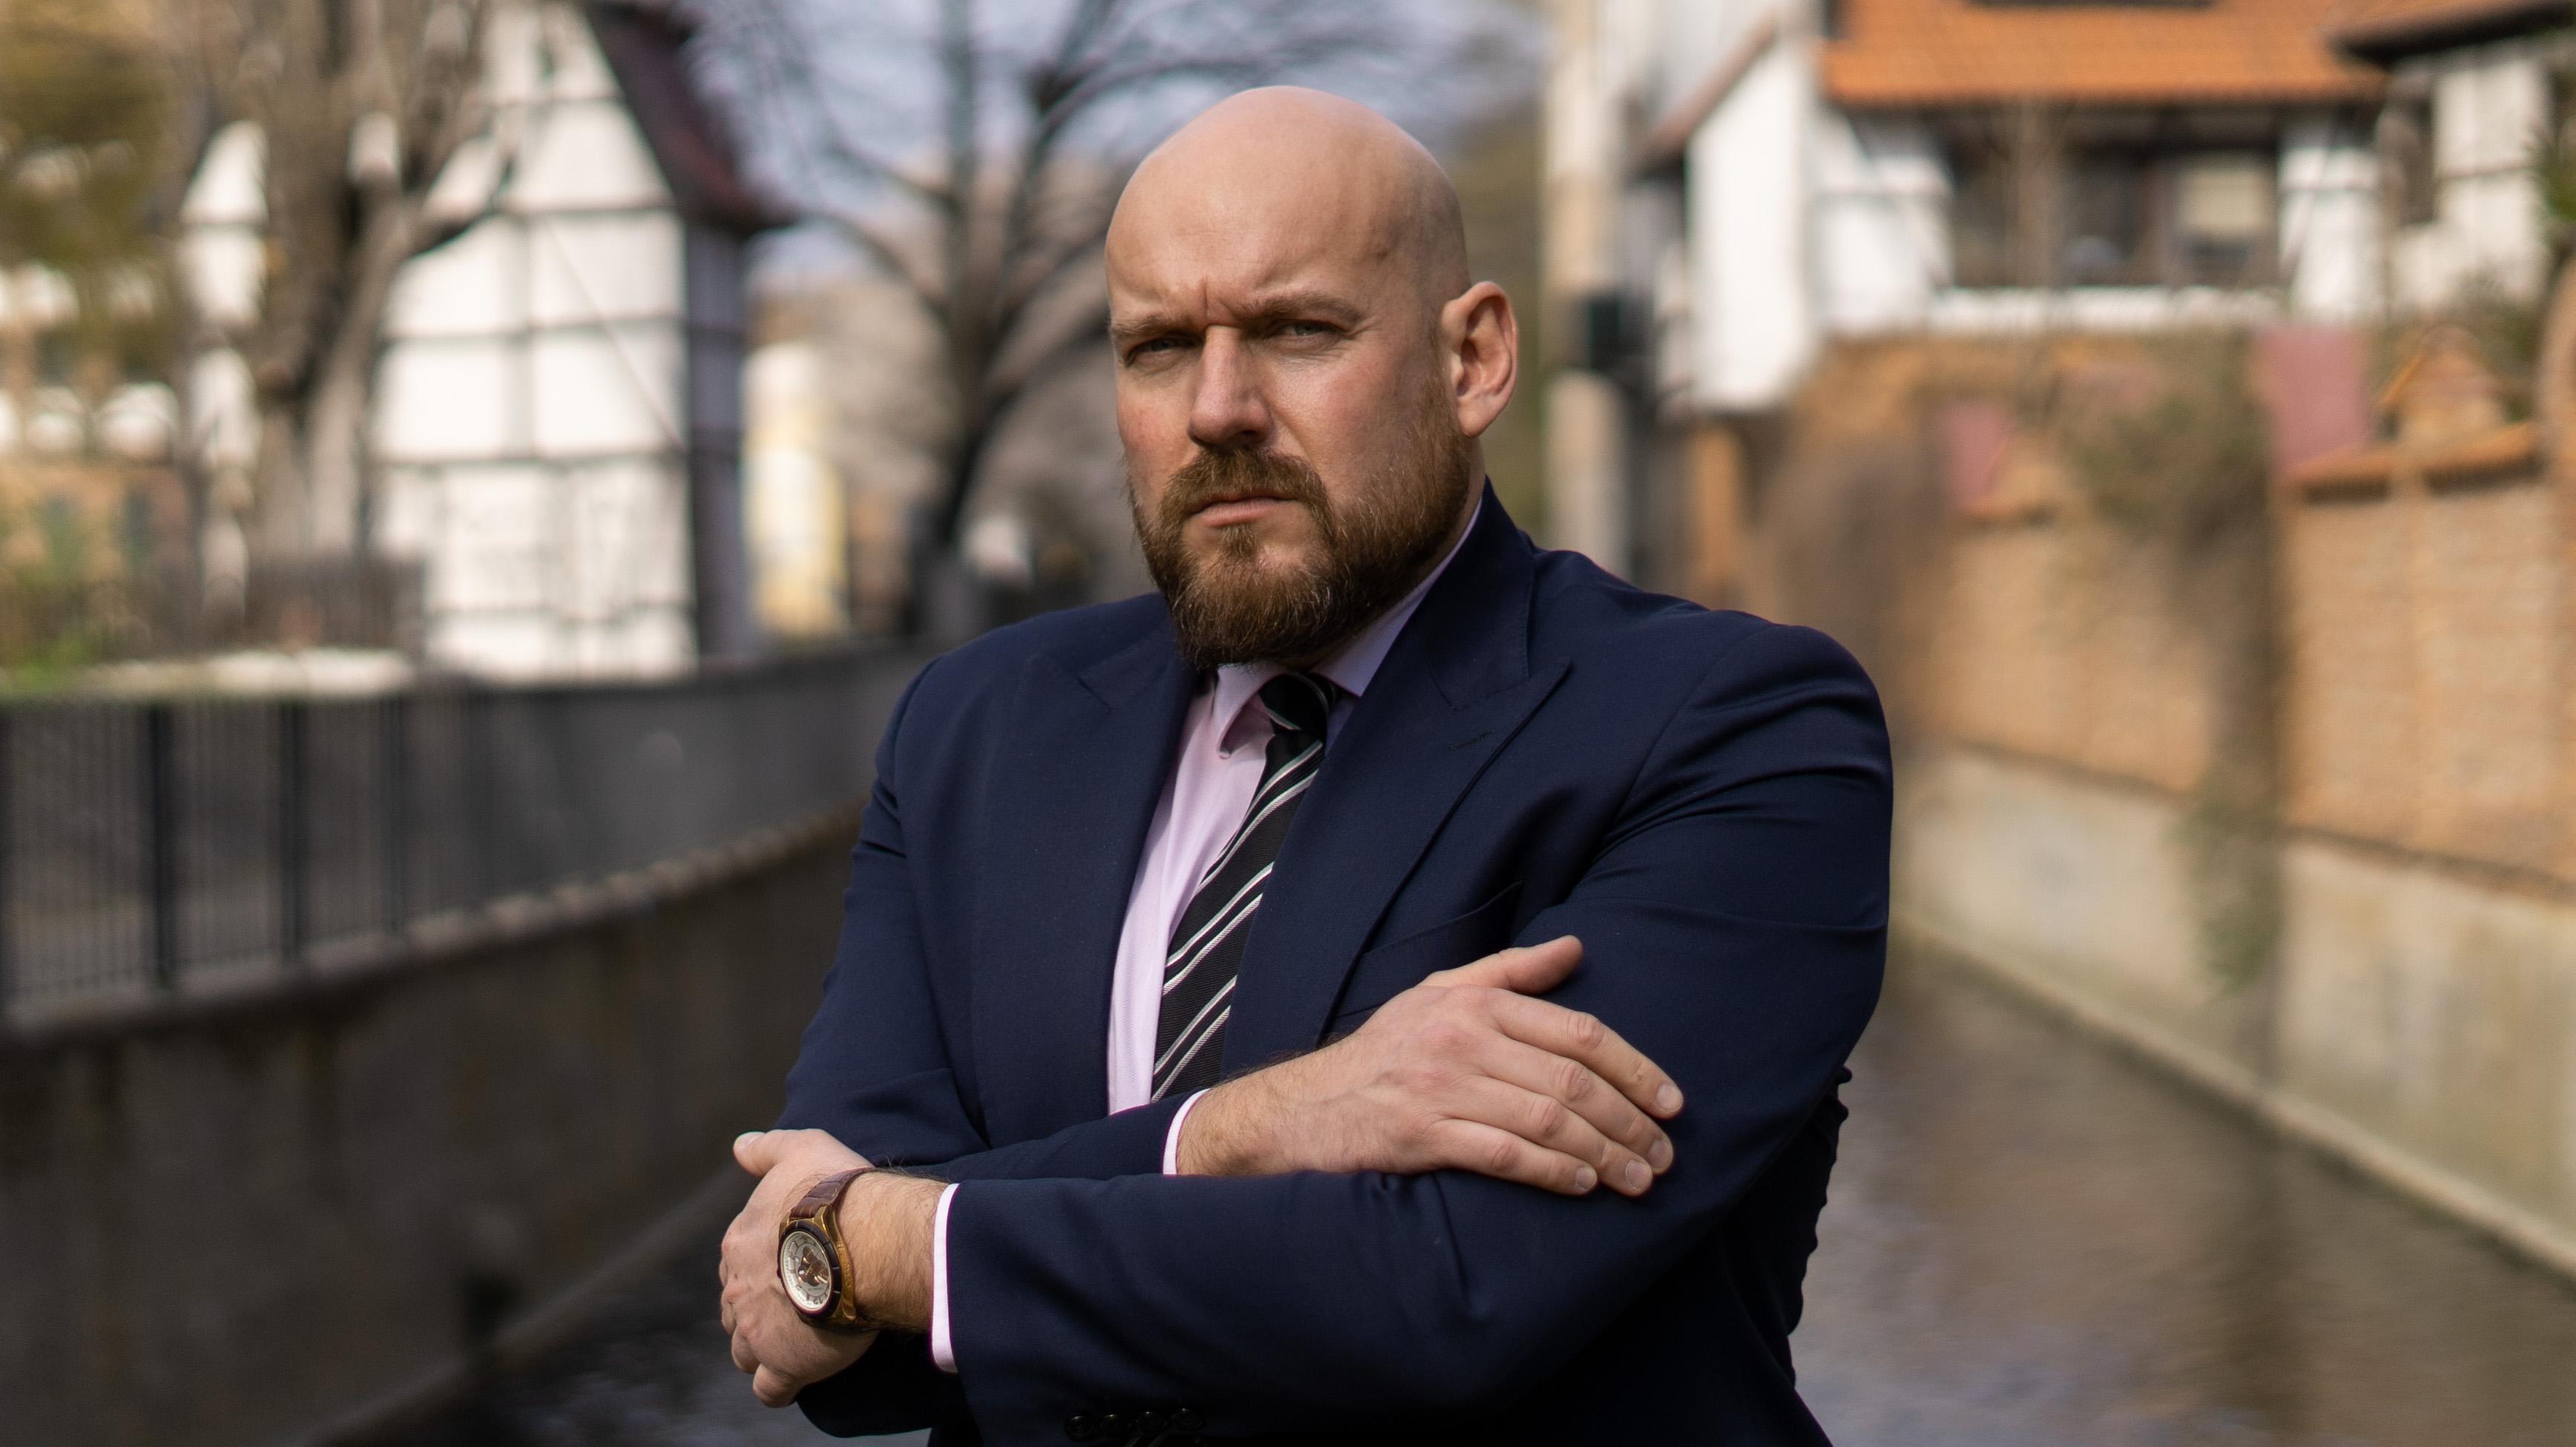 Mateusz Kowalewski